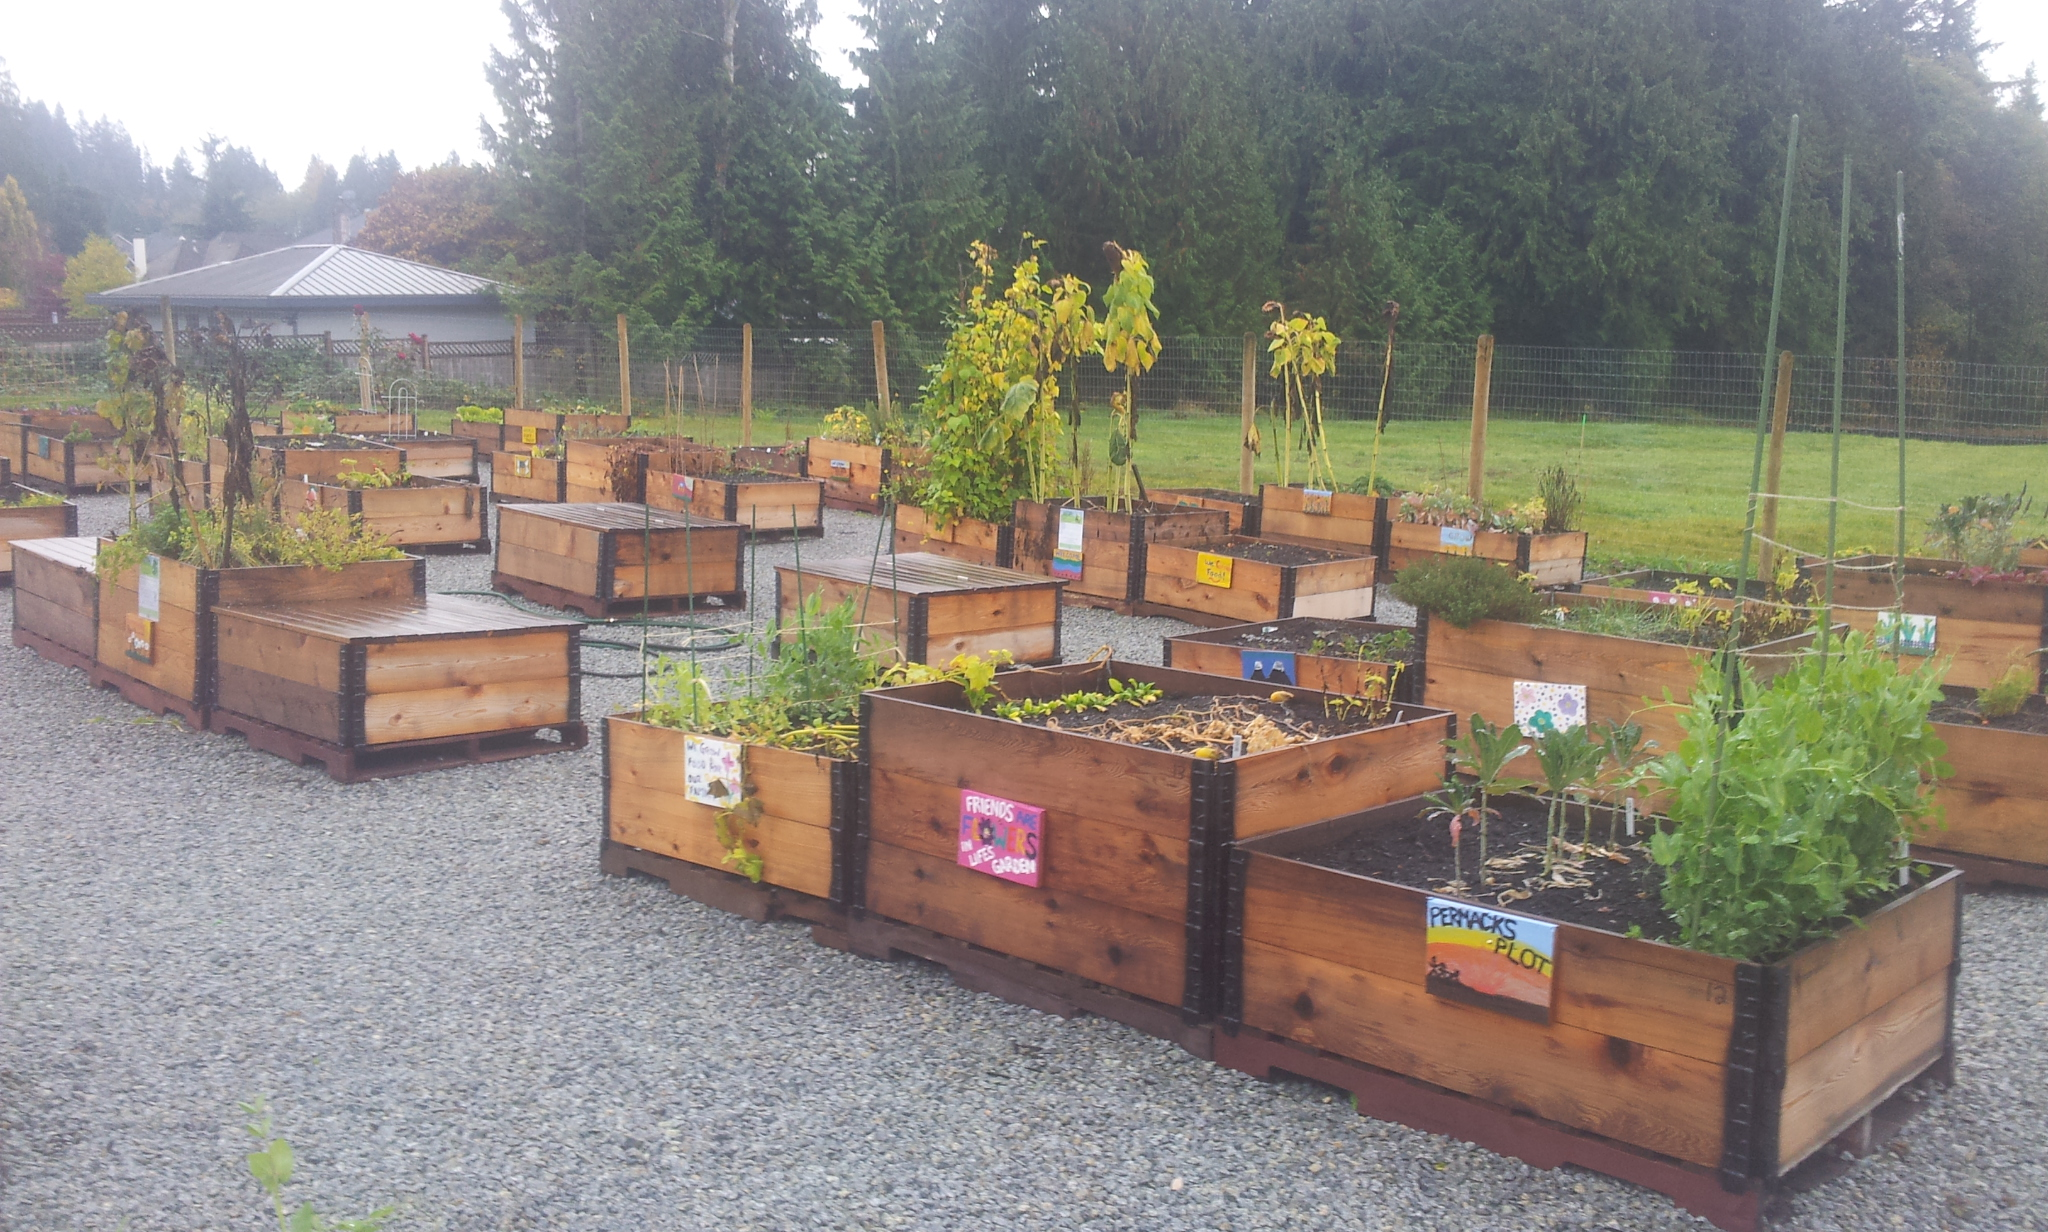 burke-mountain-temporary-community-garden-closing-112013_11244624946_o.jpg